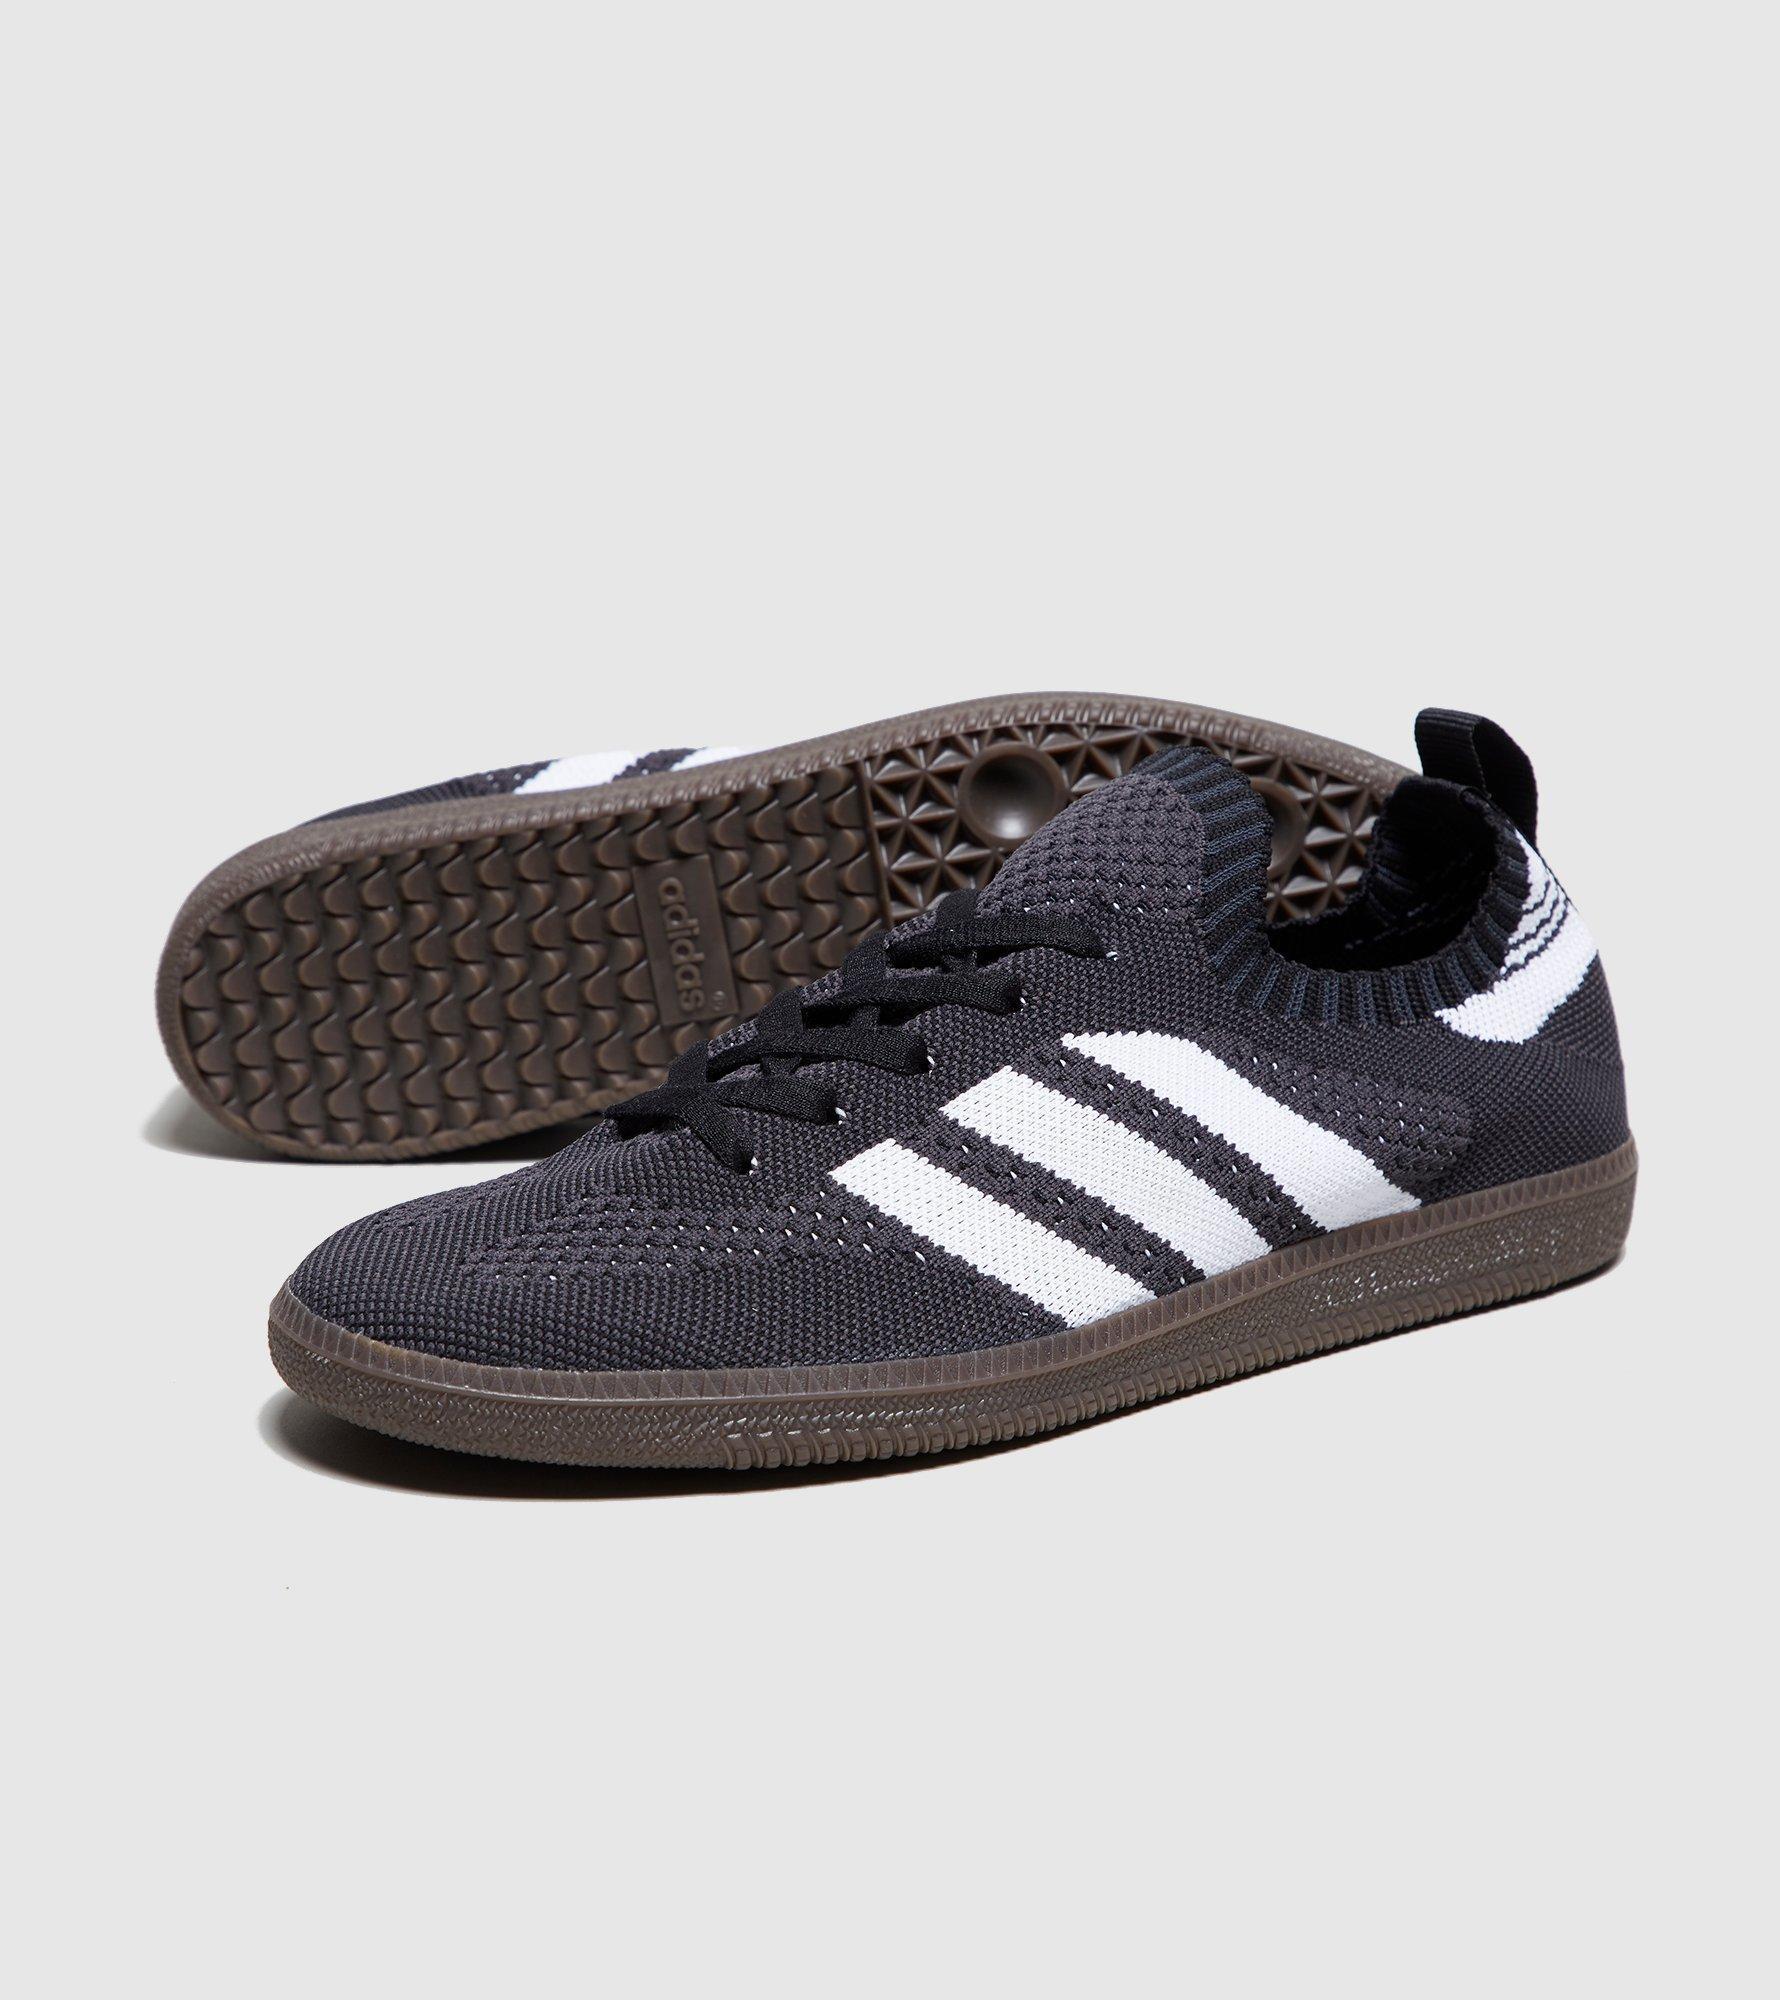 12cb4dd20 ... promo code lyst adidas originals samba primeknit in black for men 3fc4e  cf836